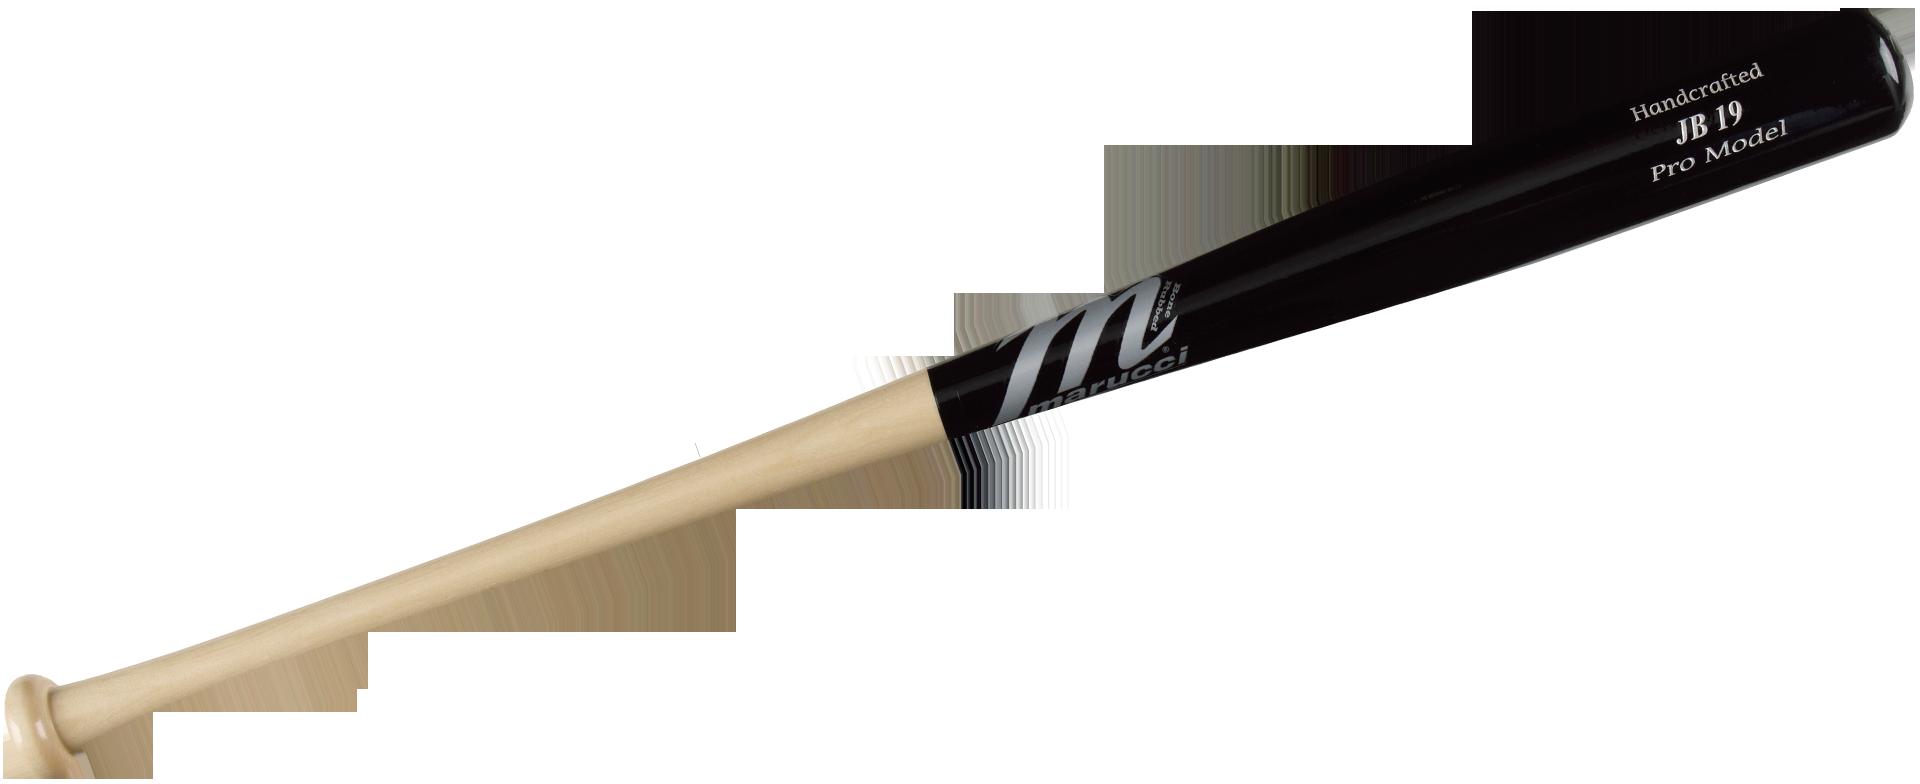 Download Baseball bat PNG